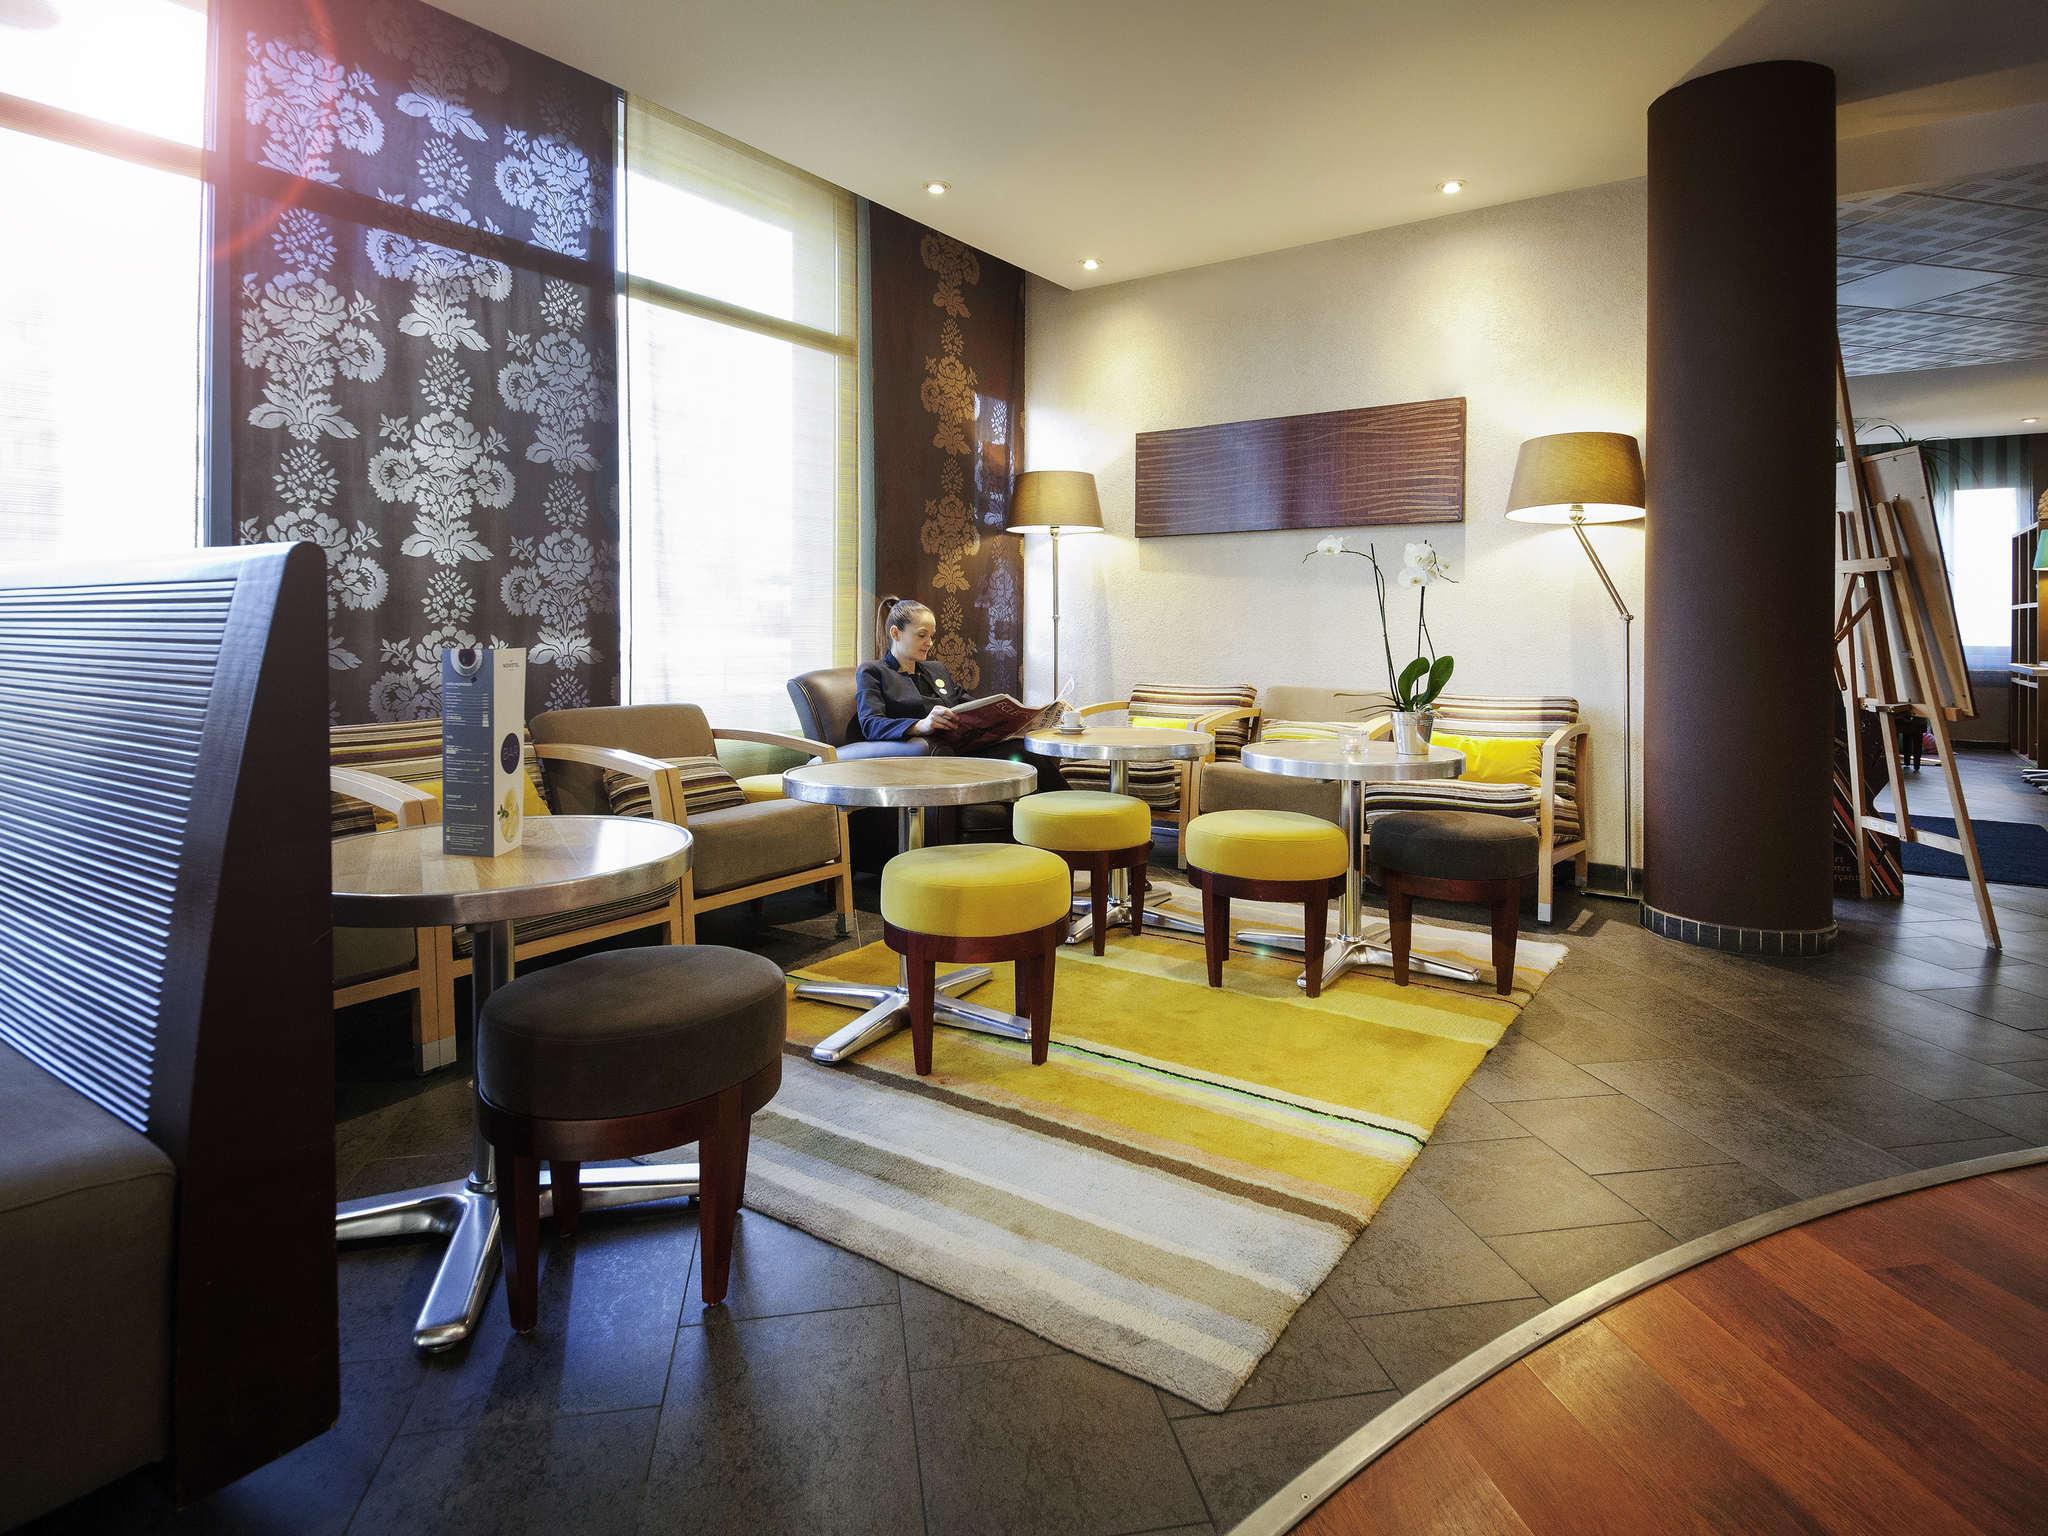 Hotel – Novotel Suites Clermont-Ferrand Polydome